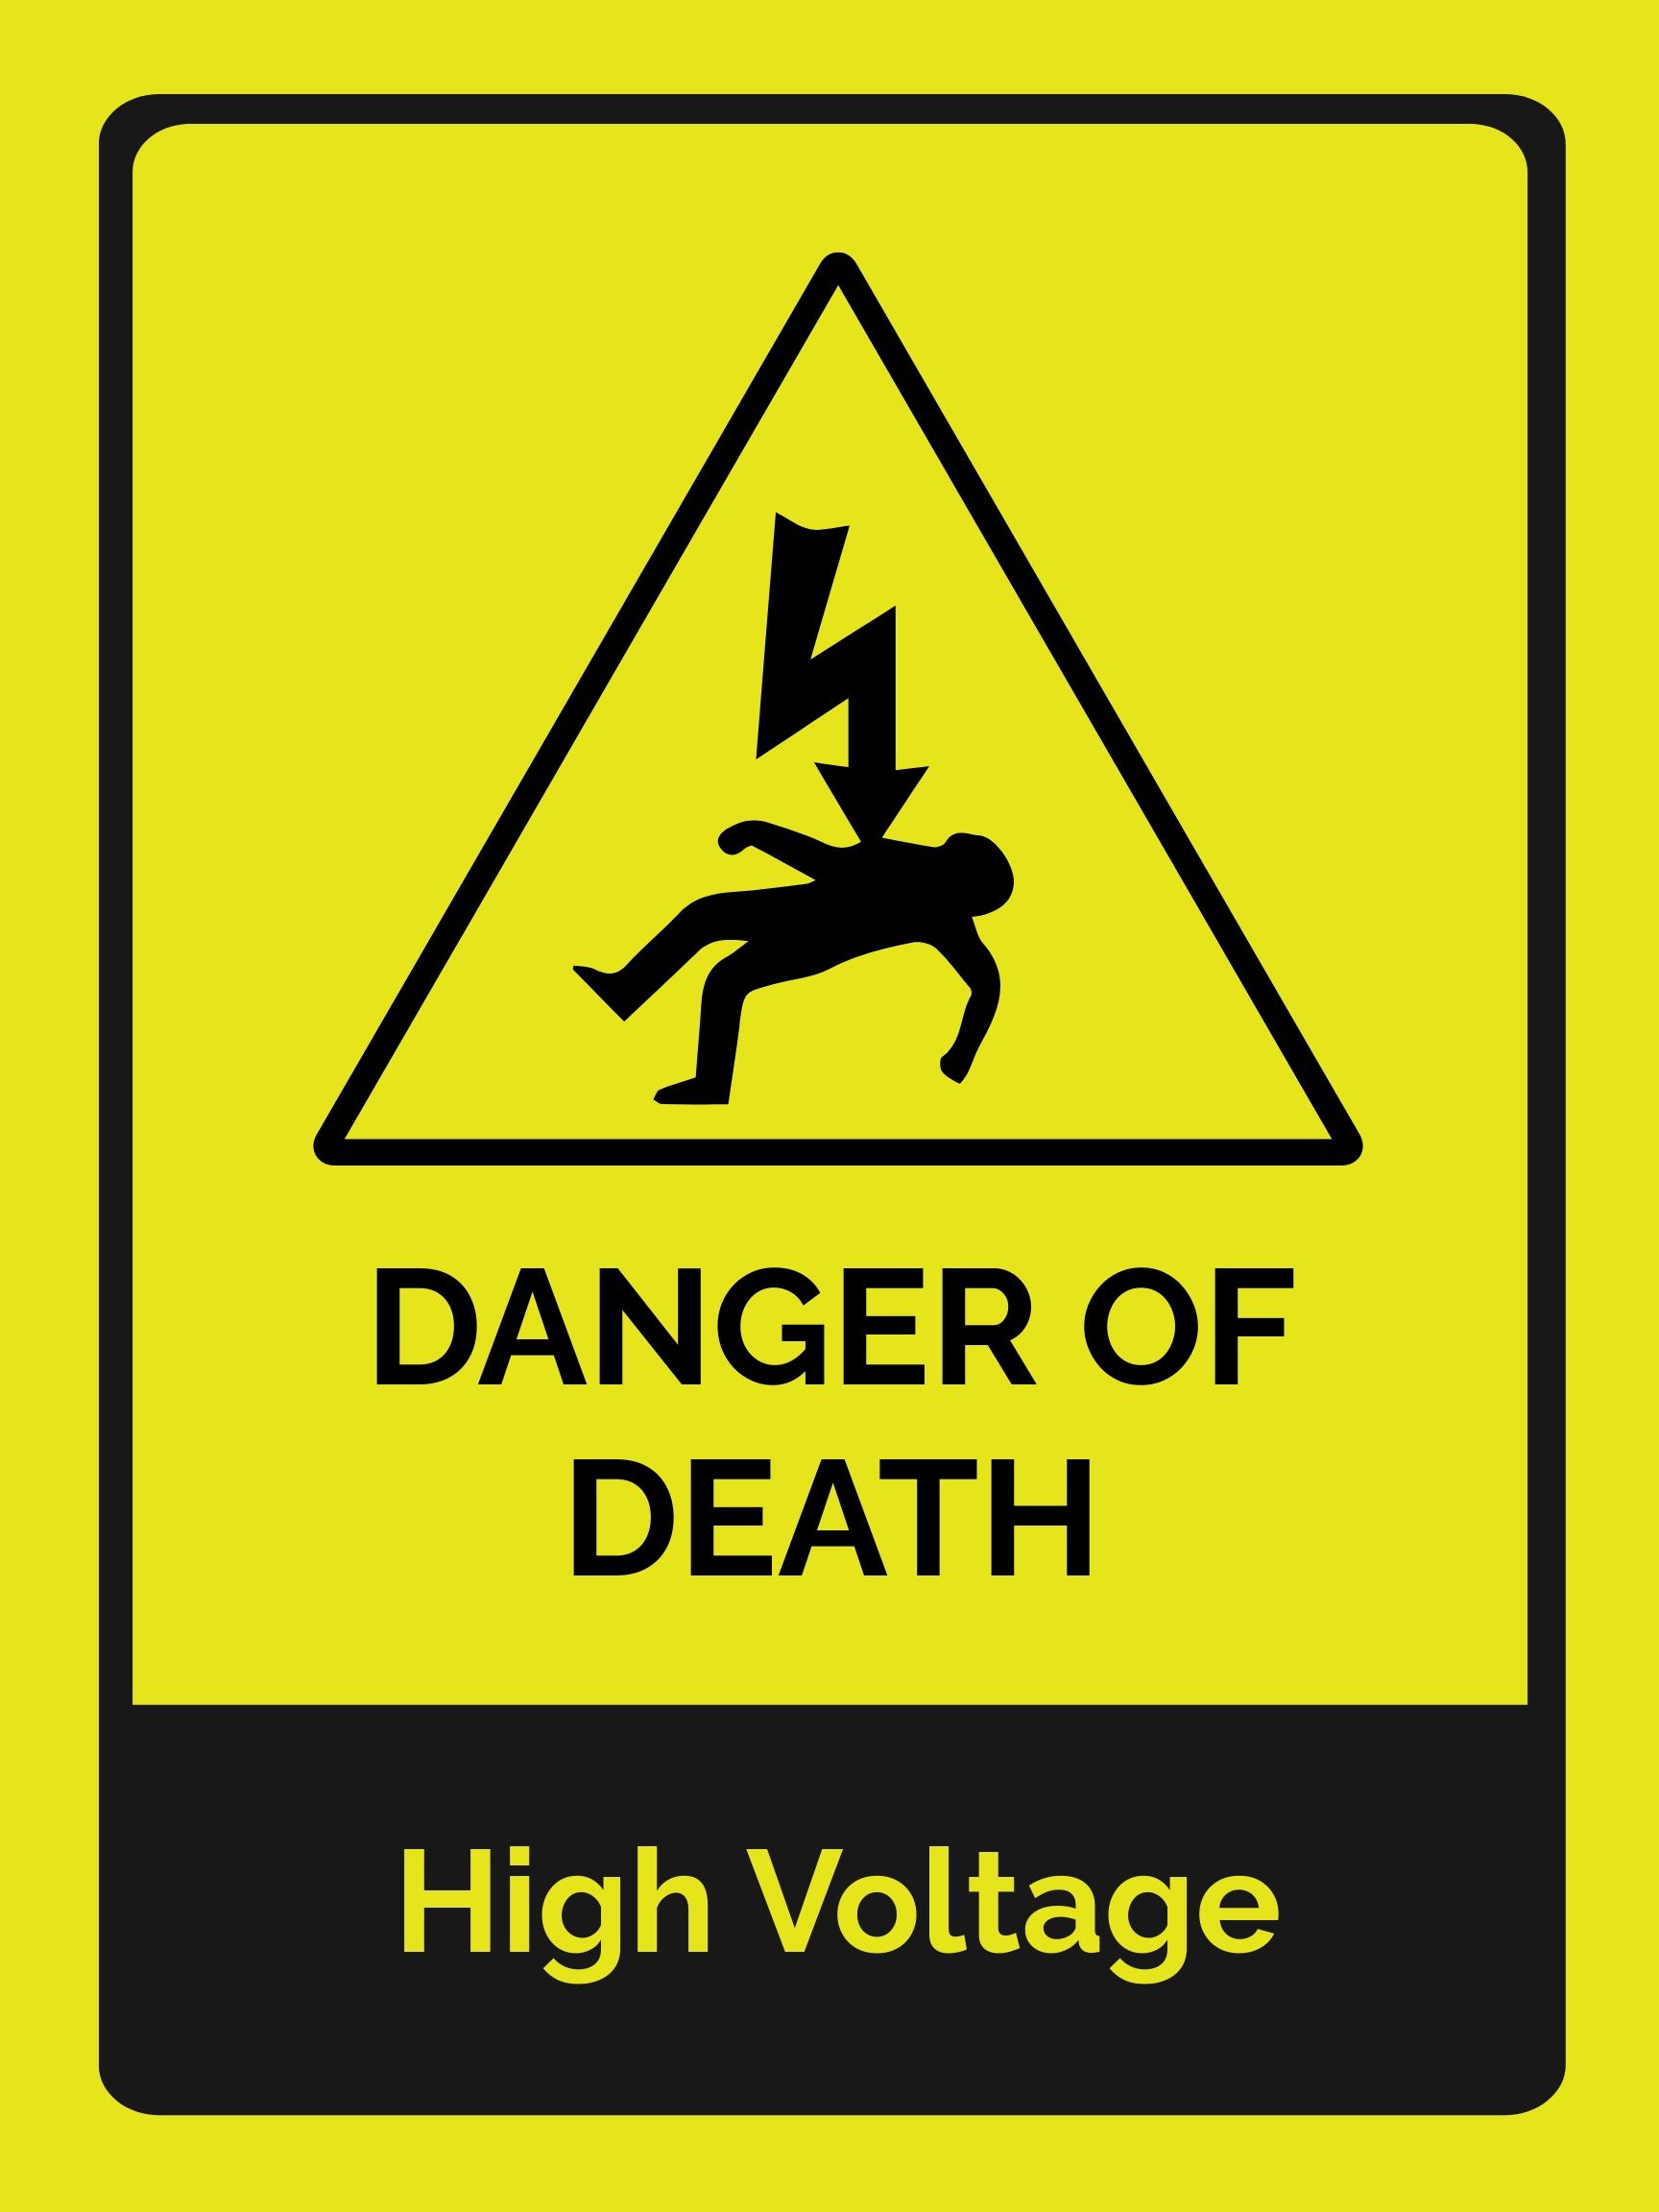 Danger of Death Sign Template